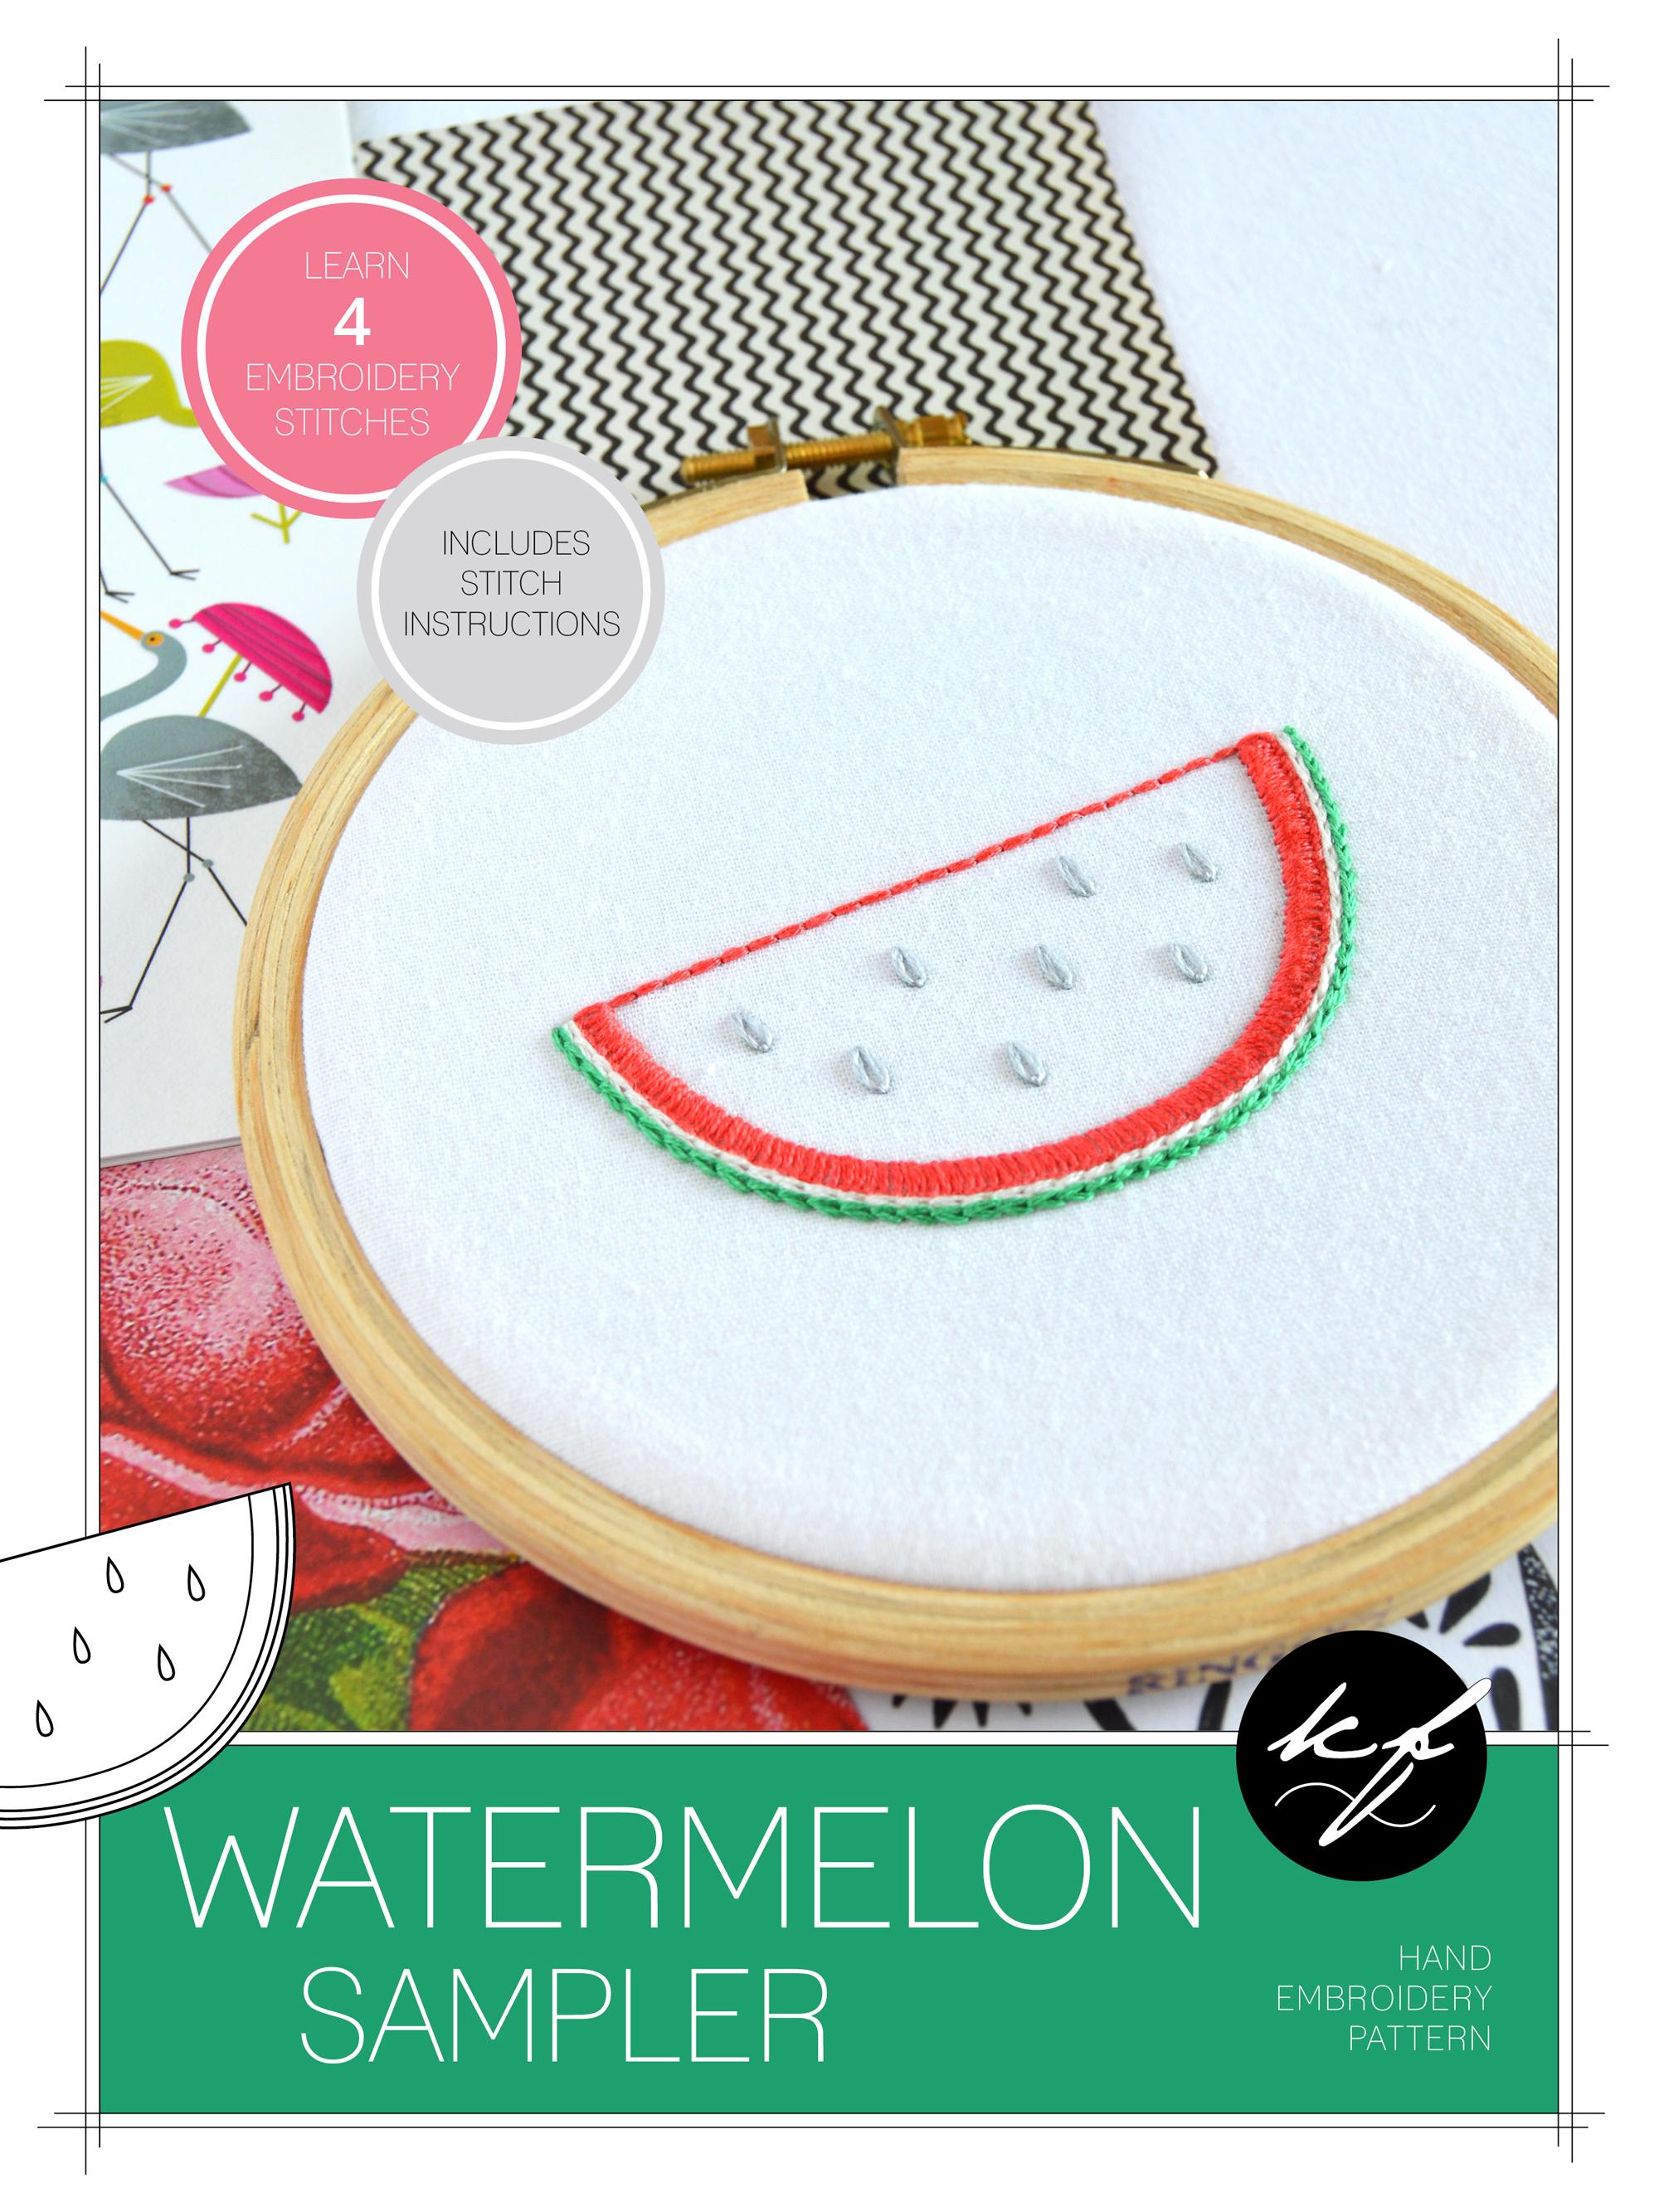 WatermelonSamplerEmbroideryPattern_KellyFletcher.jpg